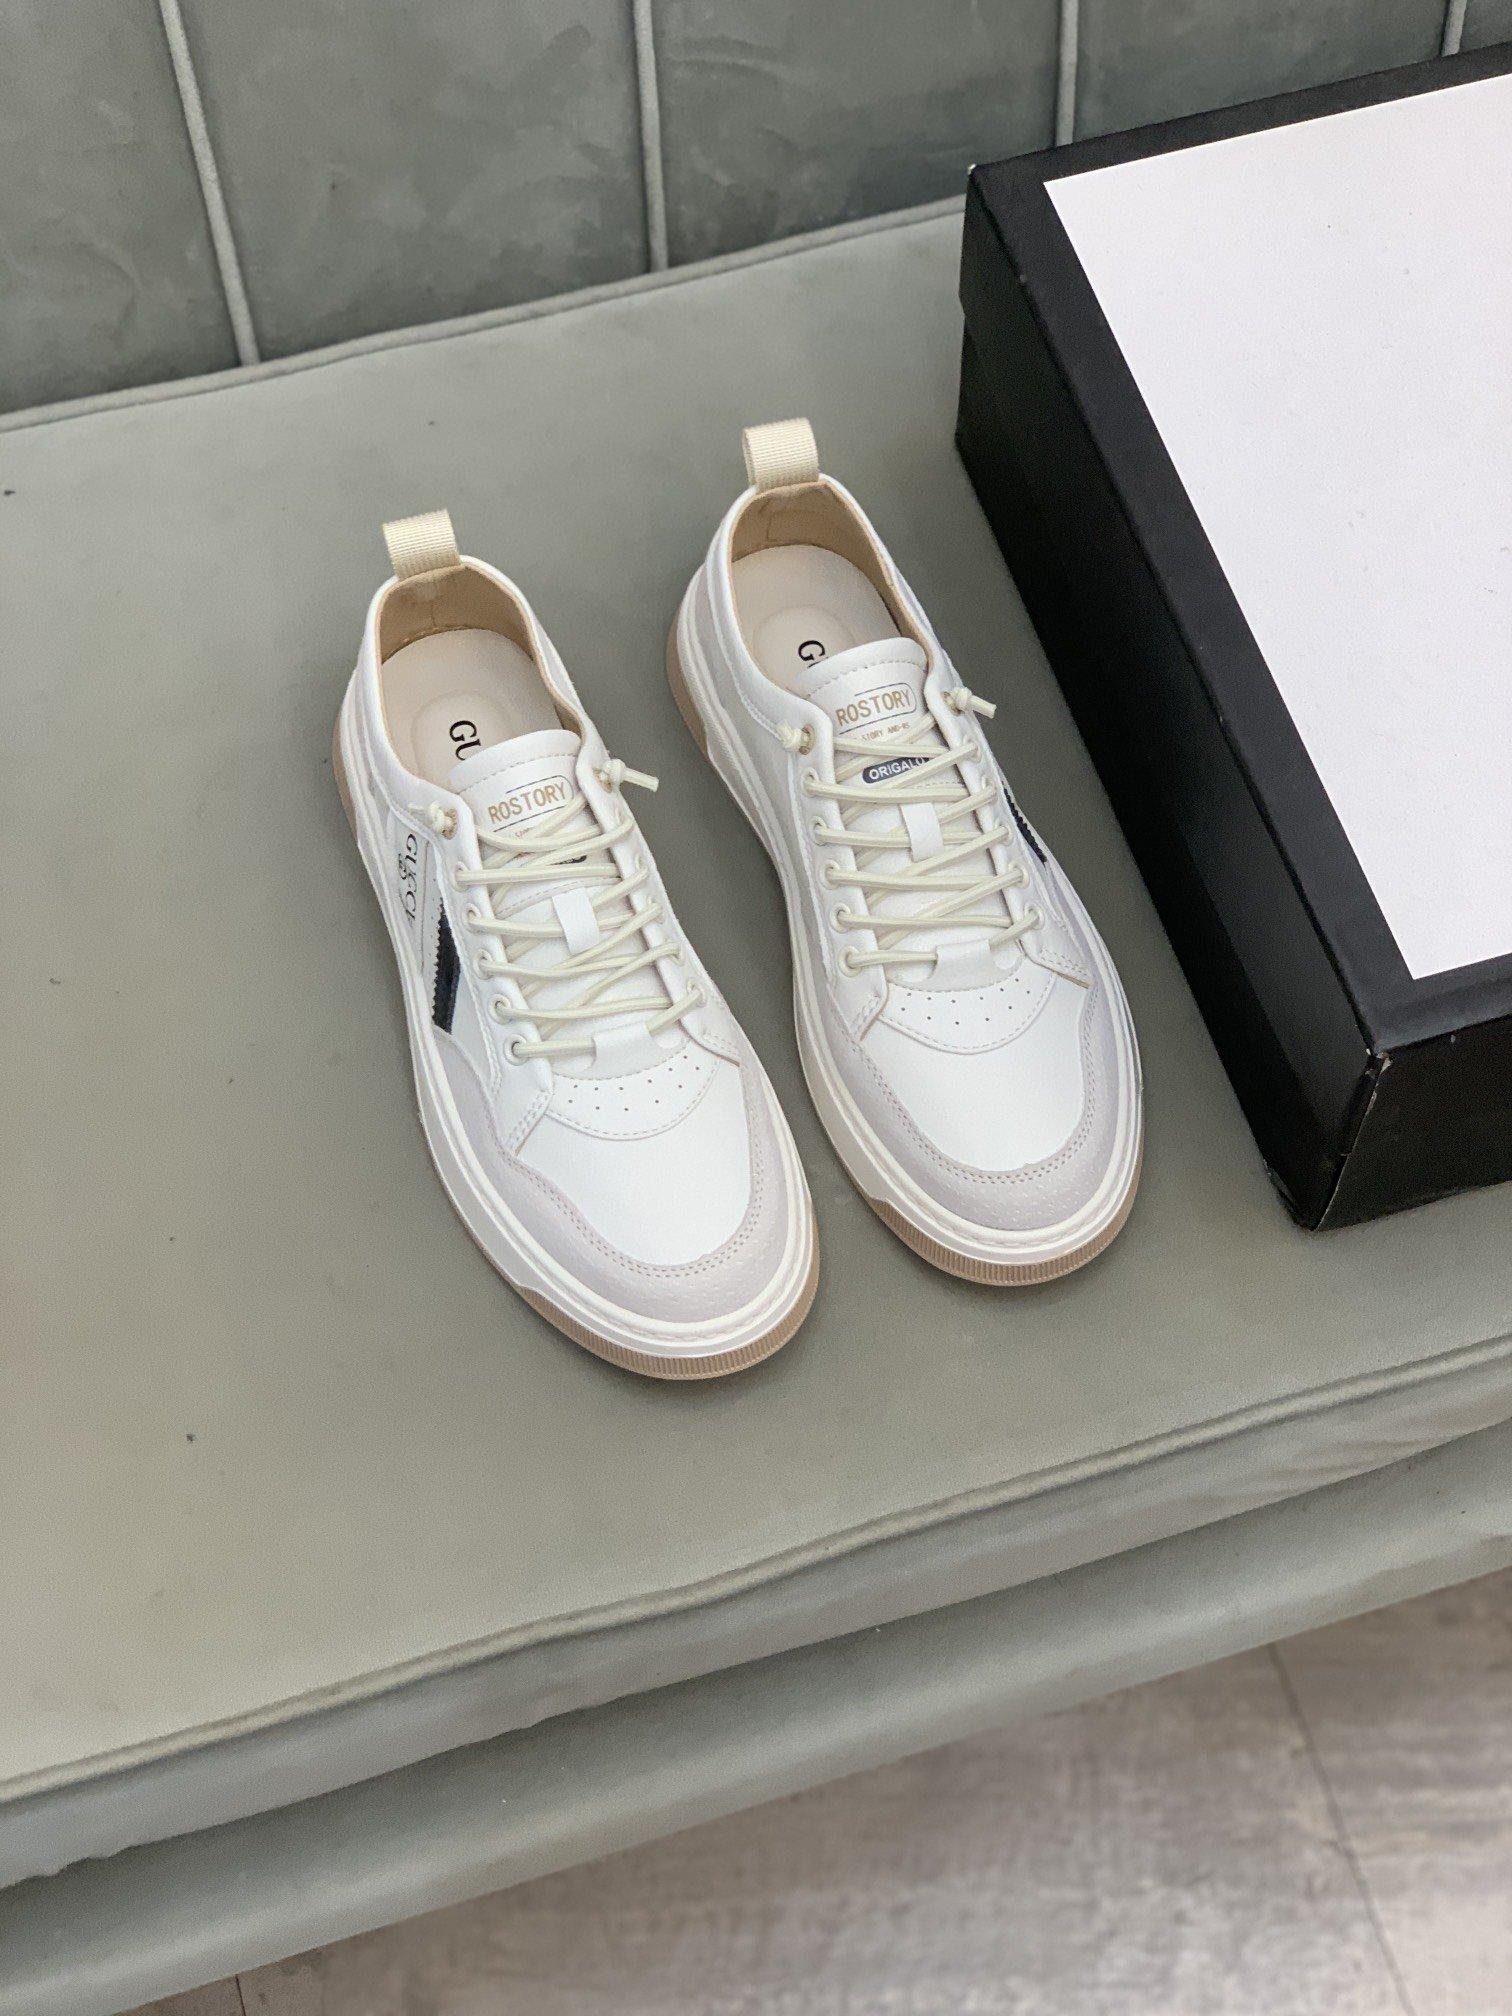 Gucc*古奇*]低帮休闲鞋正码码数